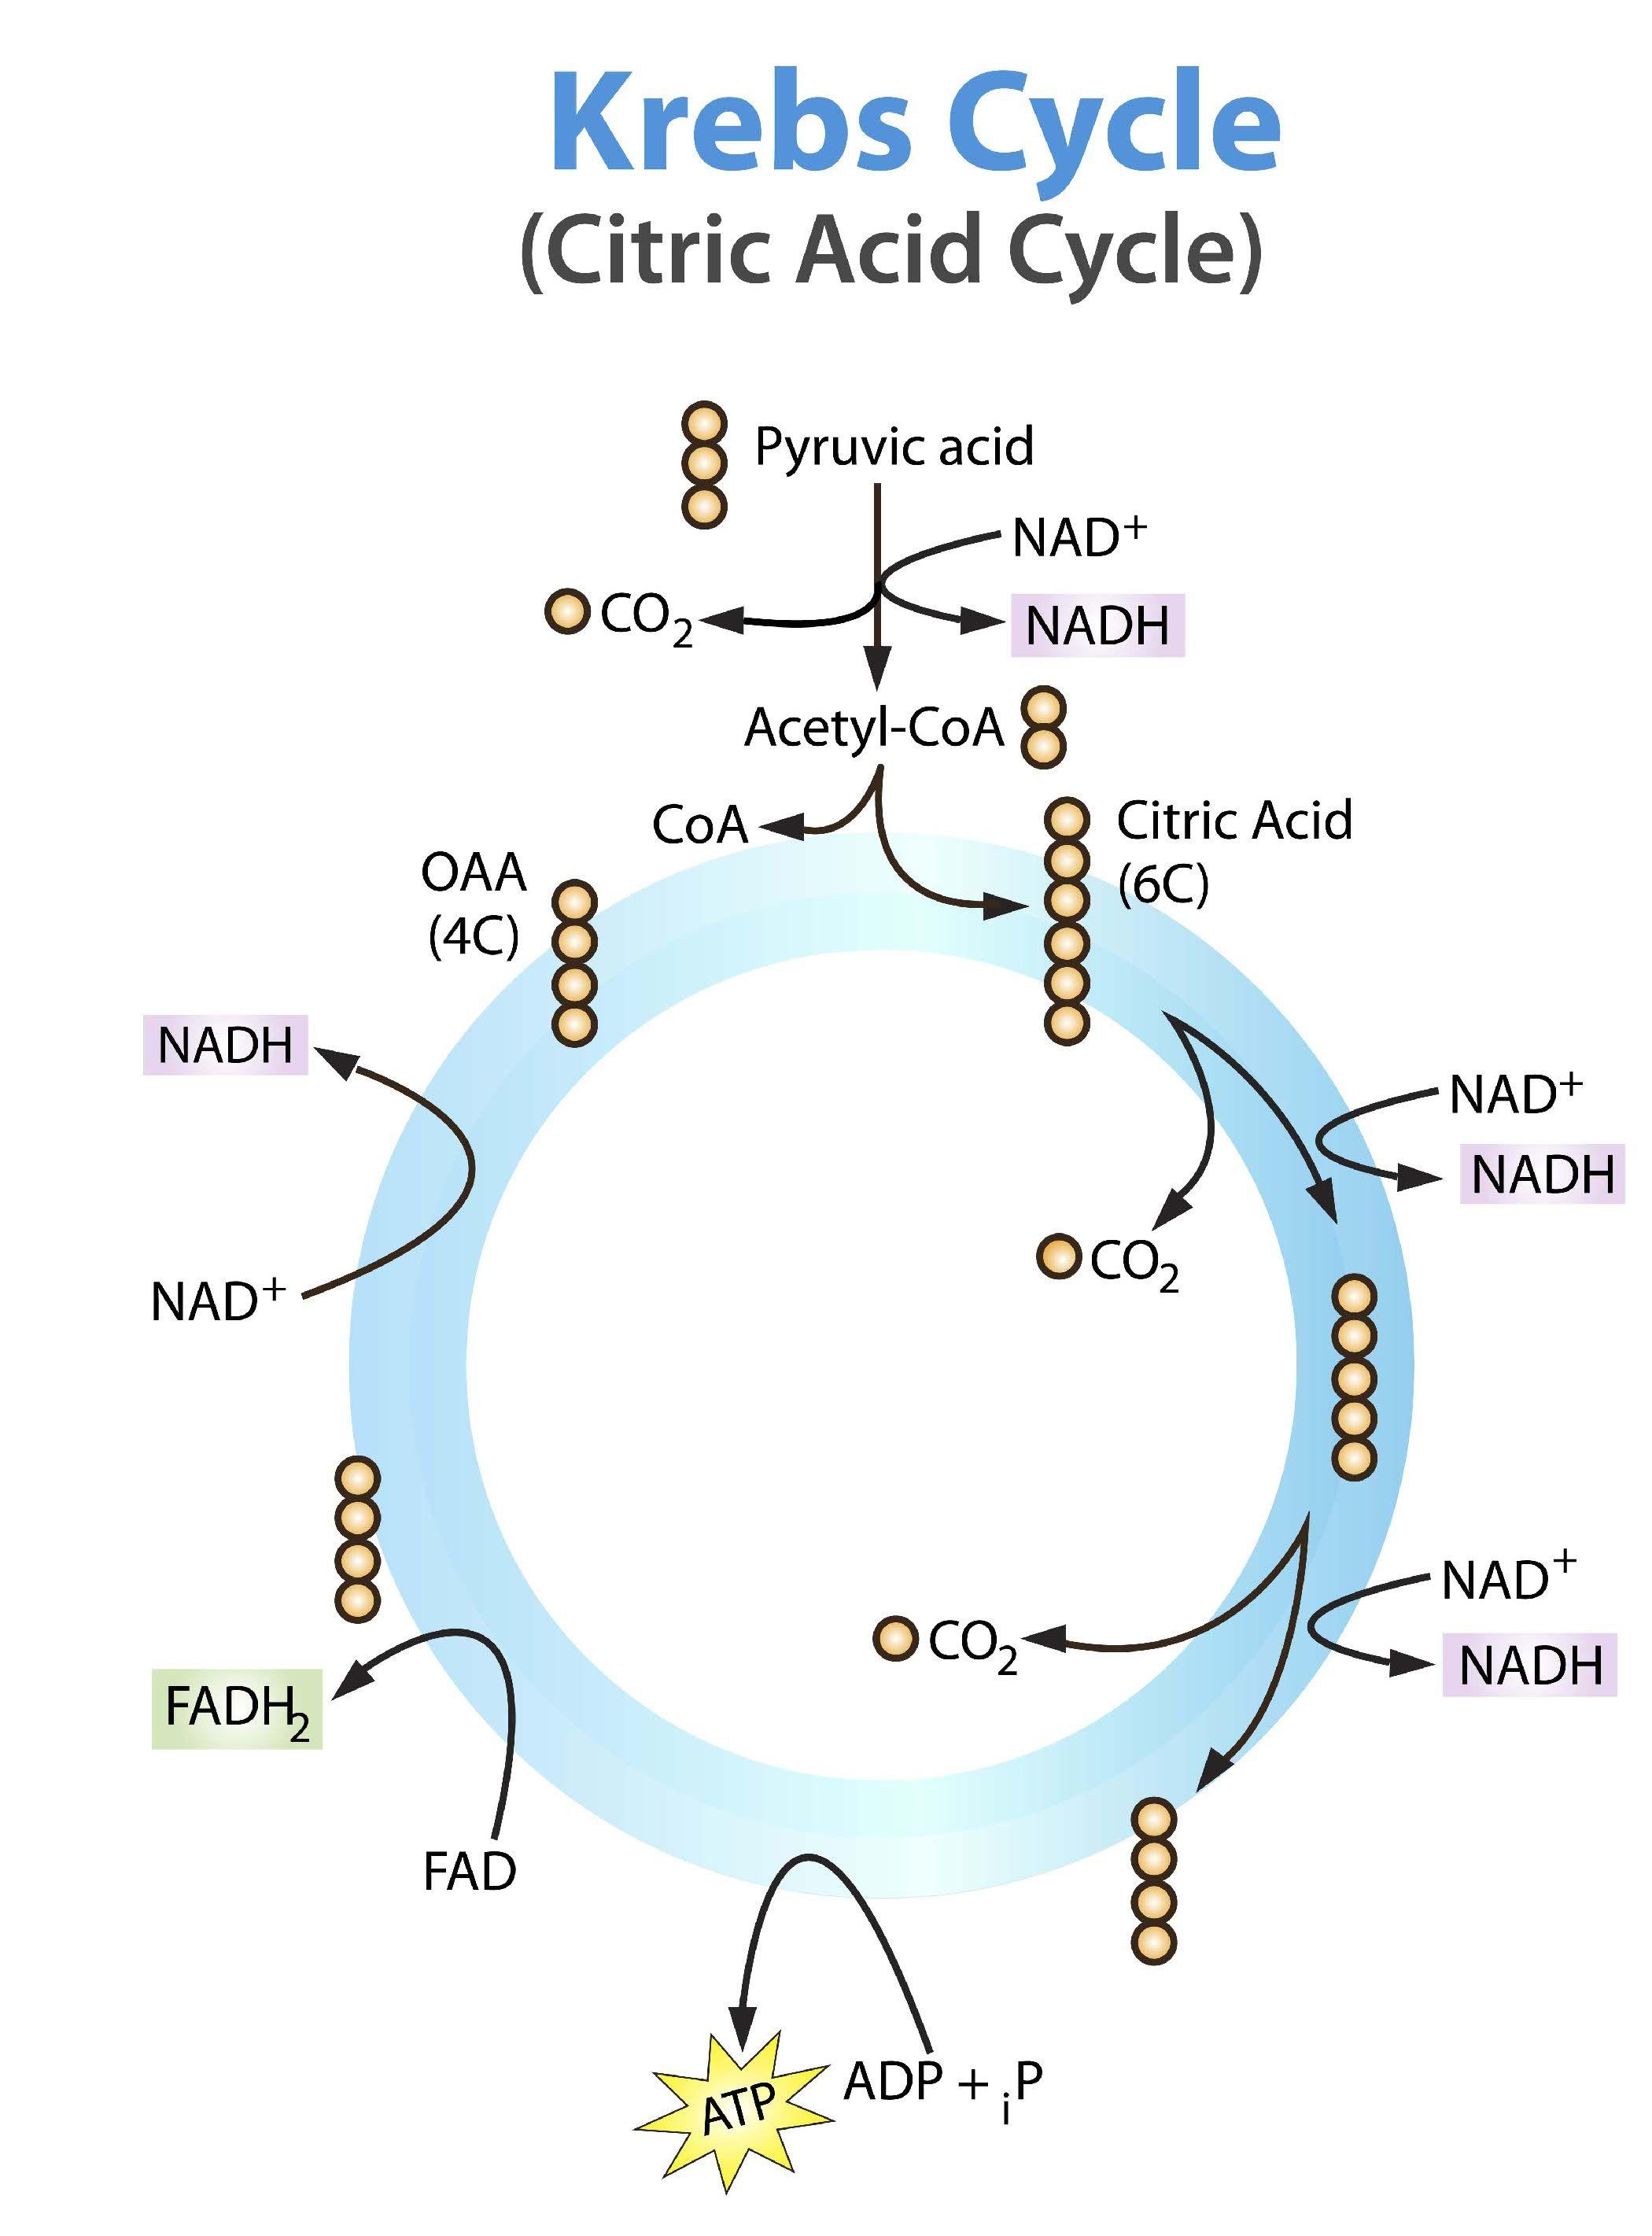 Krebs Cycle Simple And Easier To Read